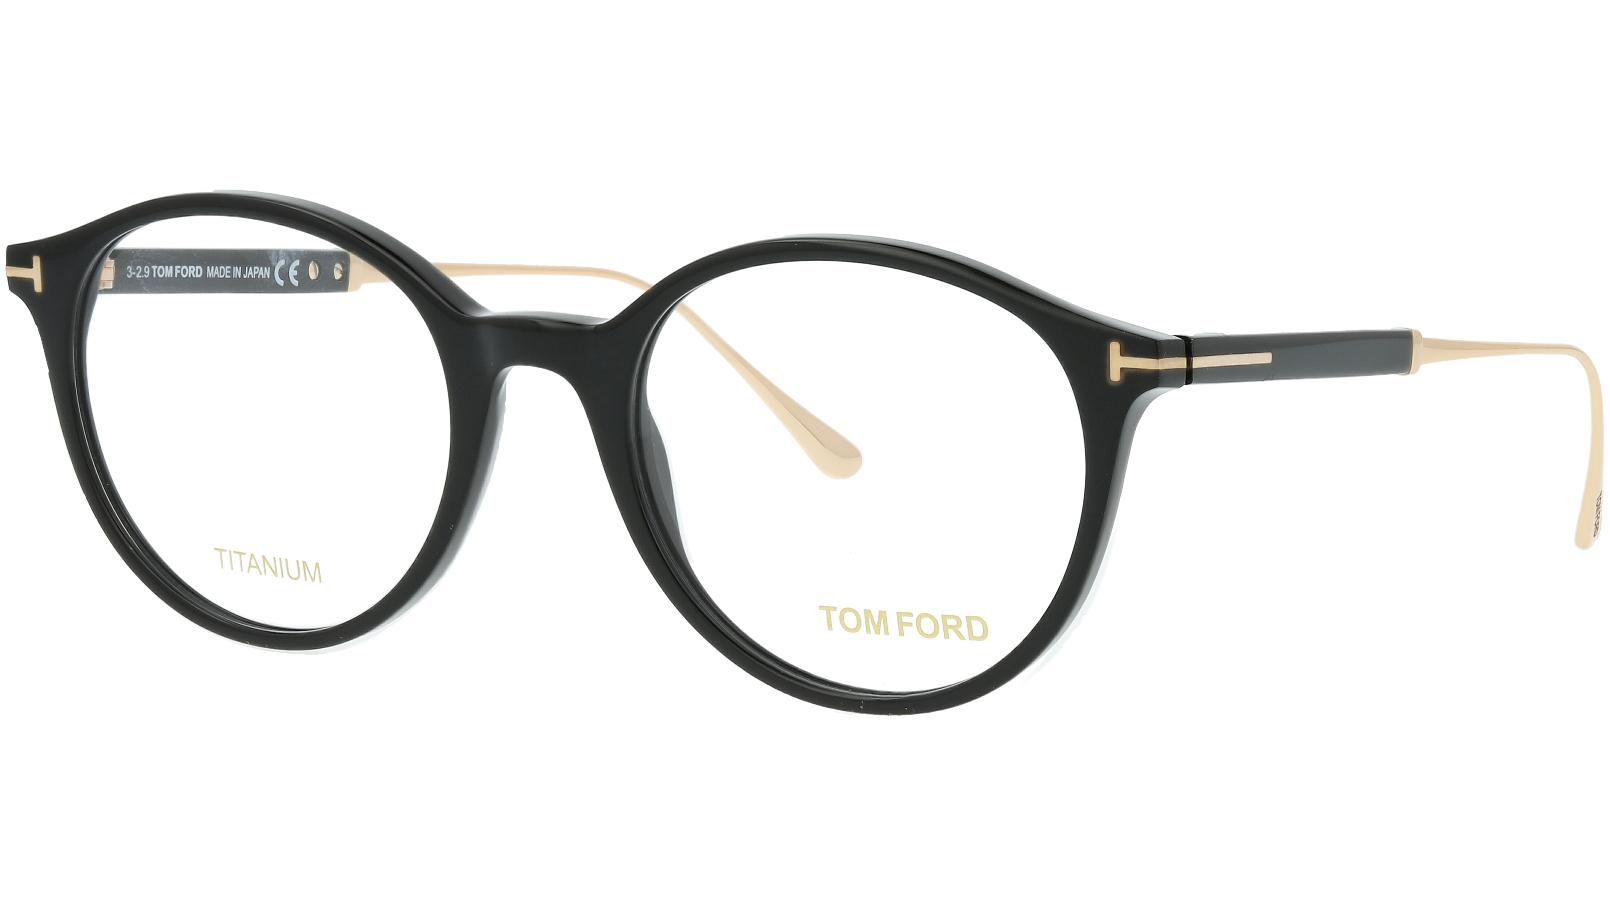 Tom Ford TF5485 001 51 Black Titanium Glasses